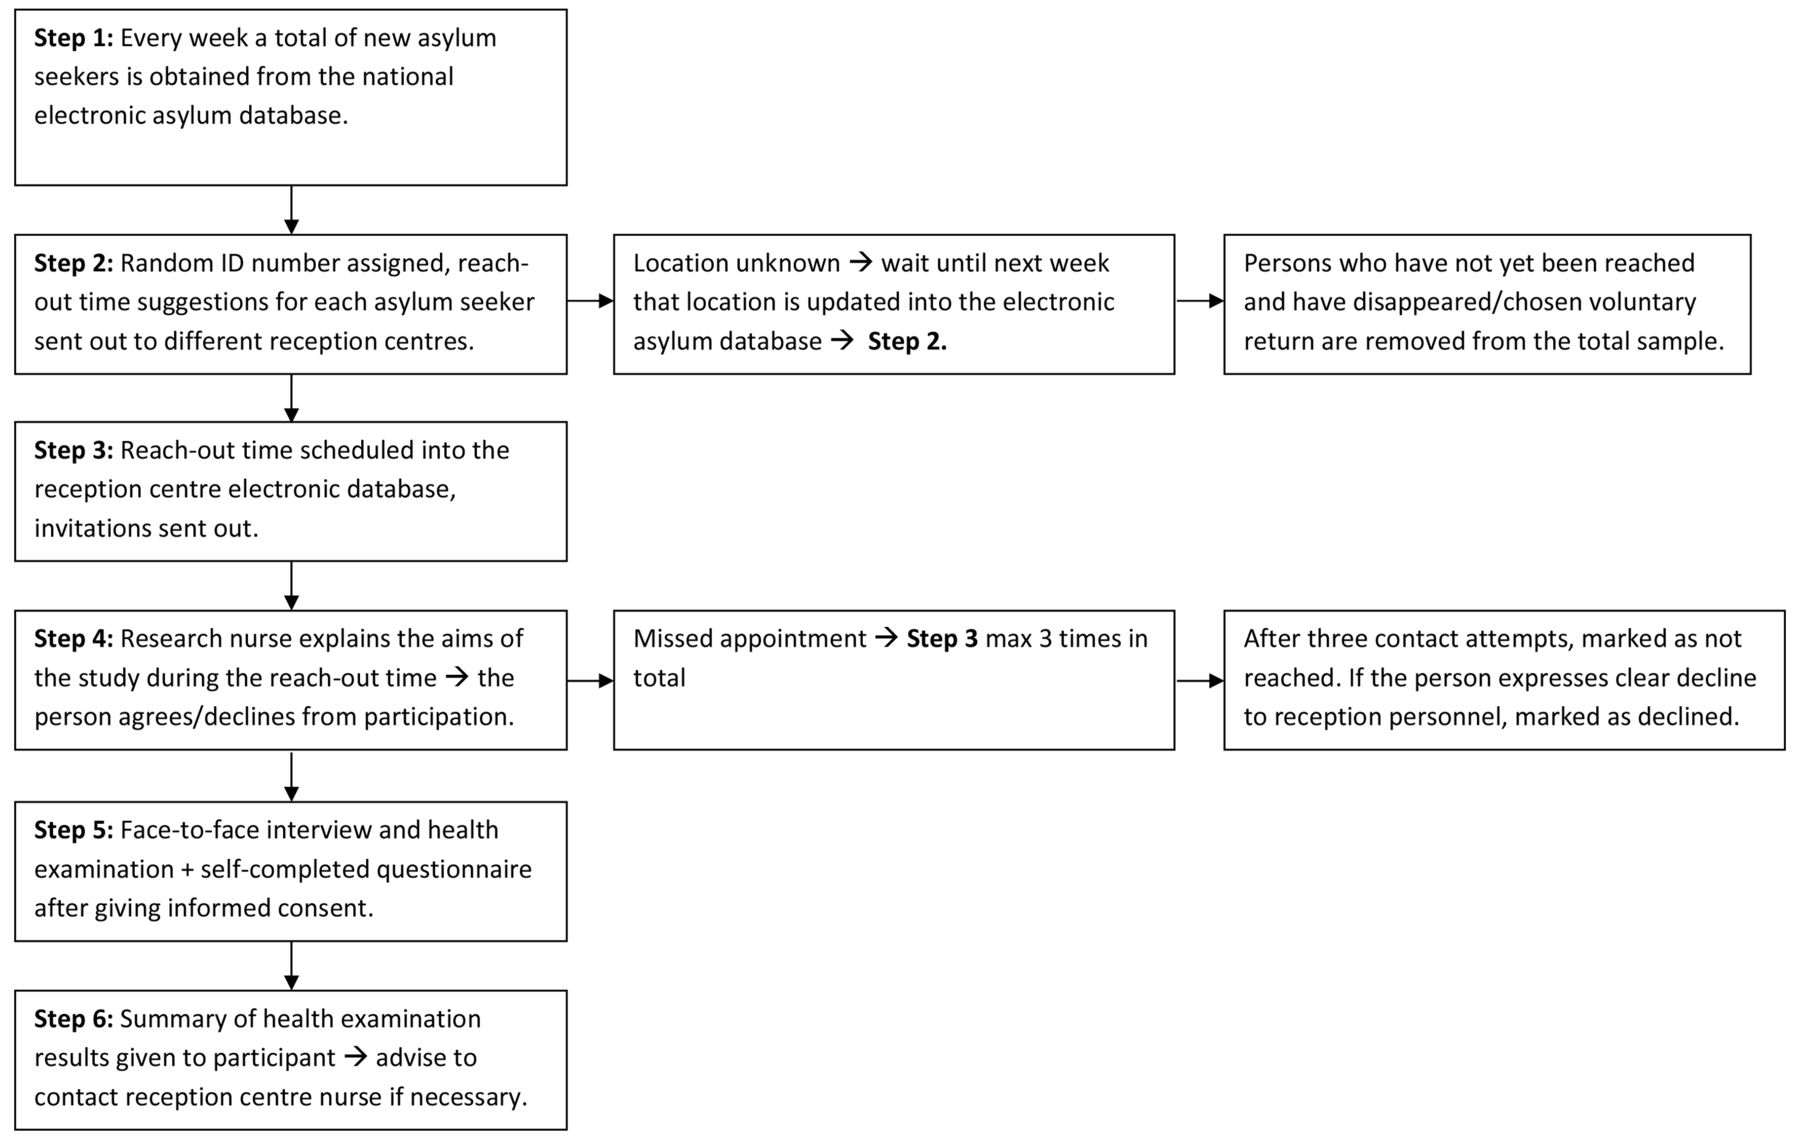 Asylum seekers health and wellbeing (TERTTU) survey: study protocol